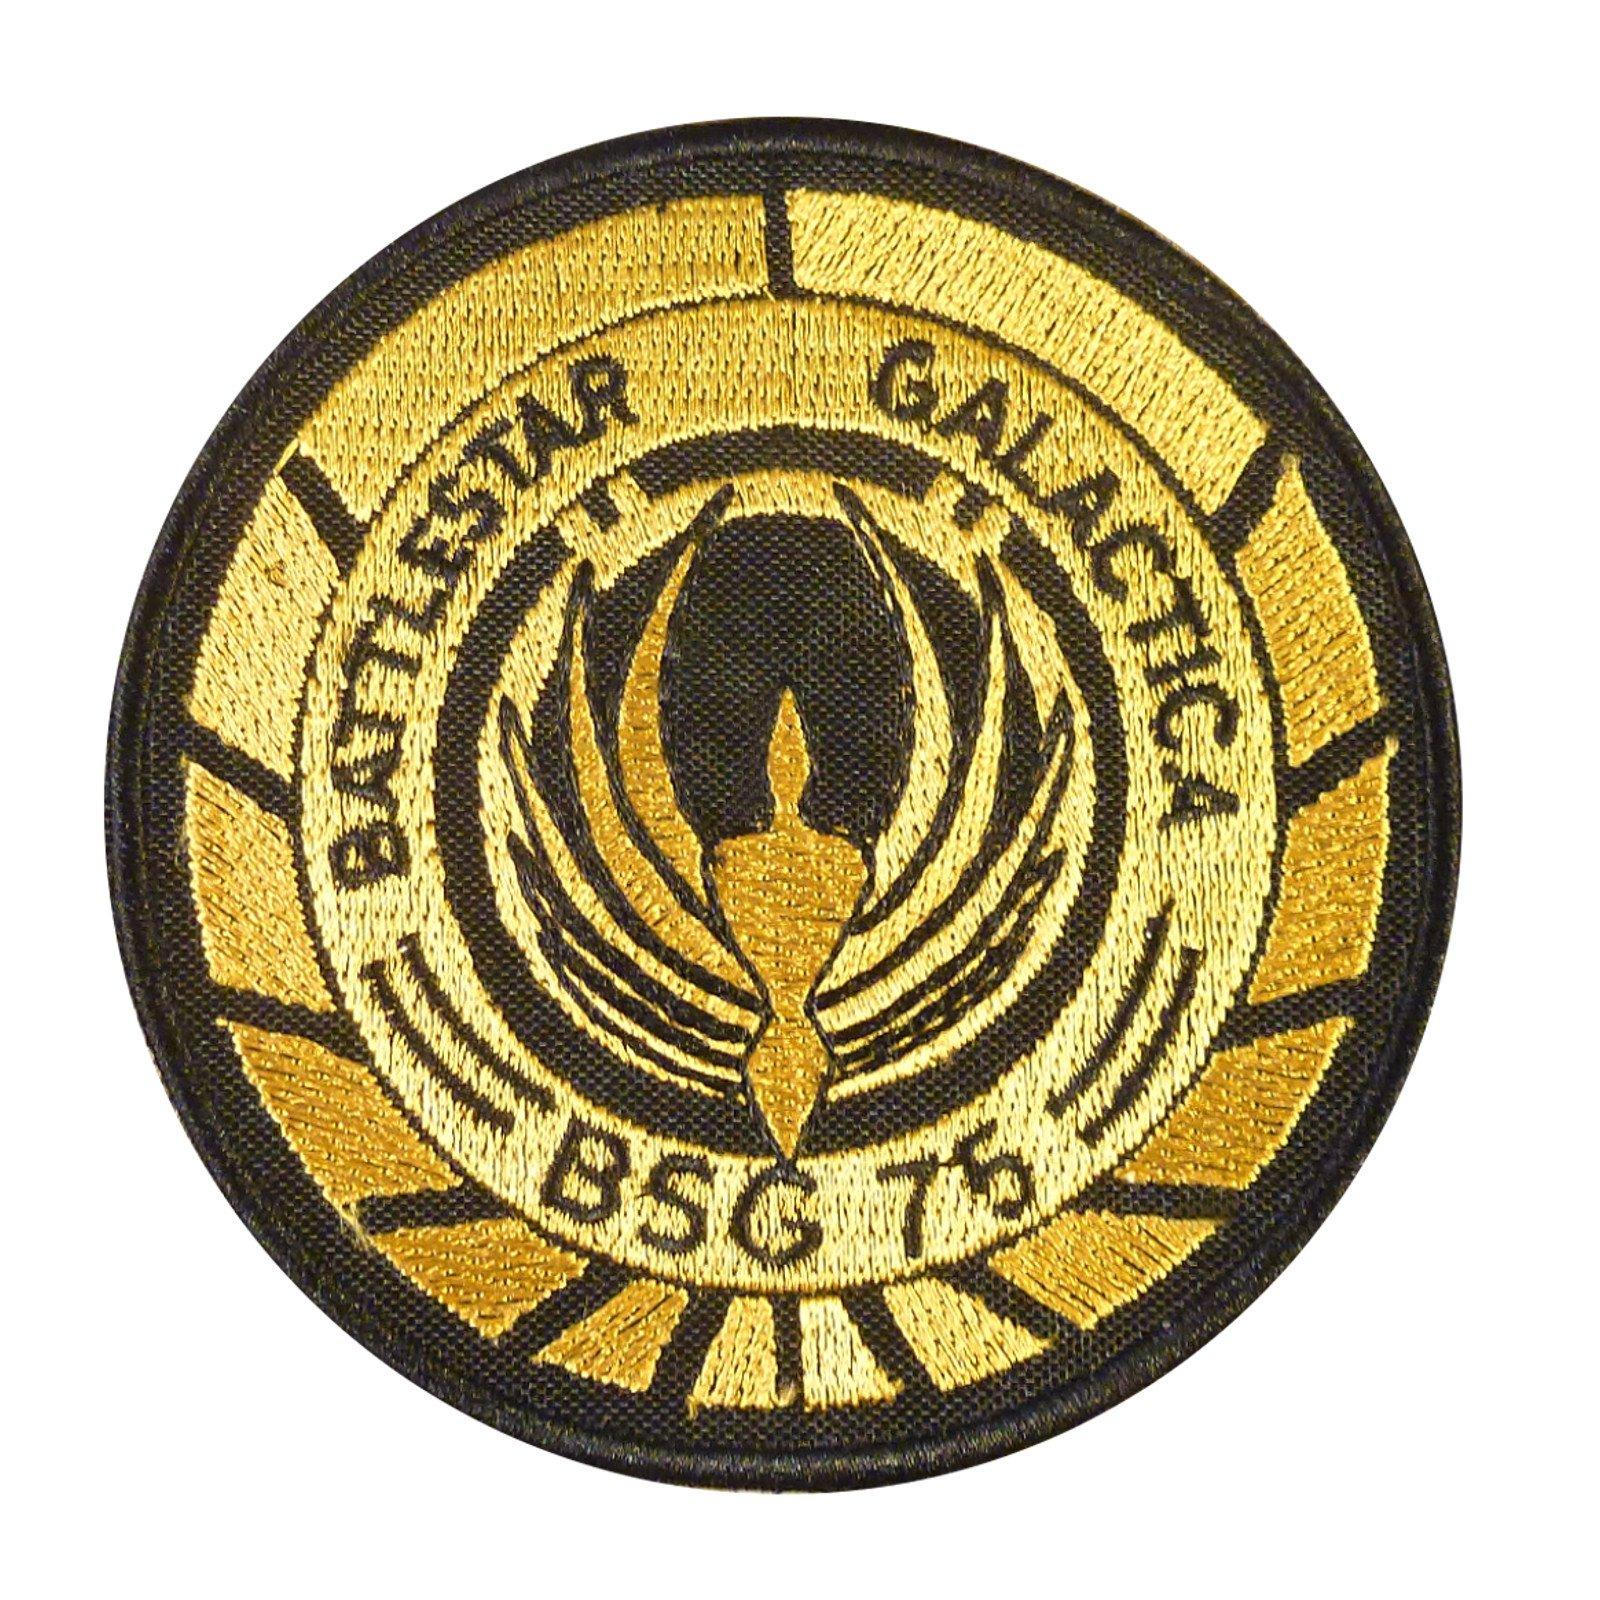 Battlestar Galactica BSG 75 Officer Shoulder Golden Ricamata Ricamo Fastener Toppa Patch